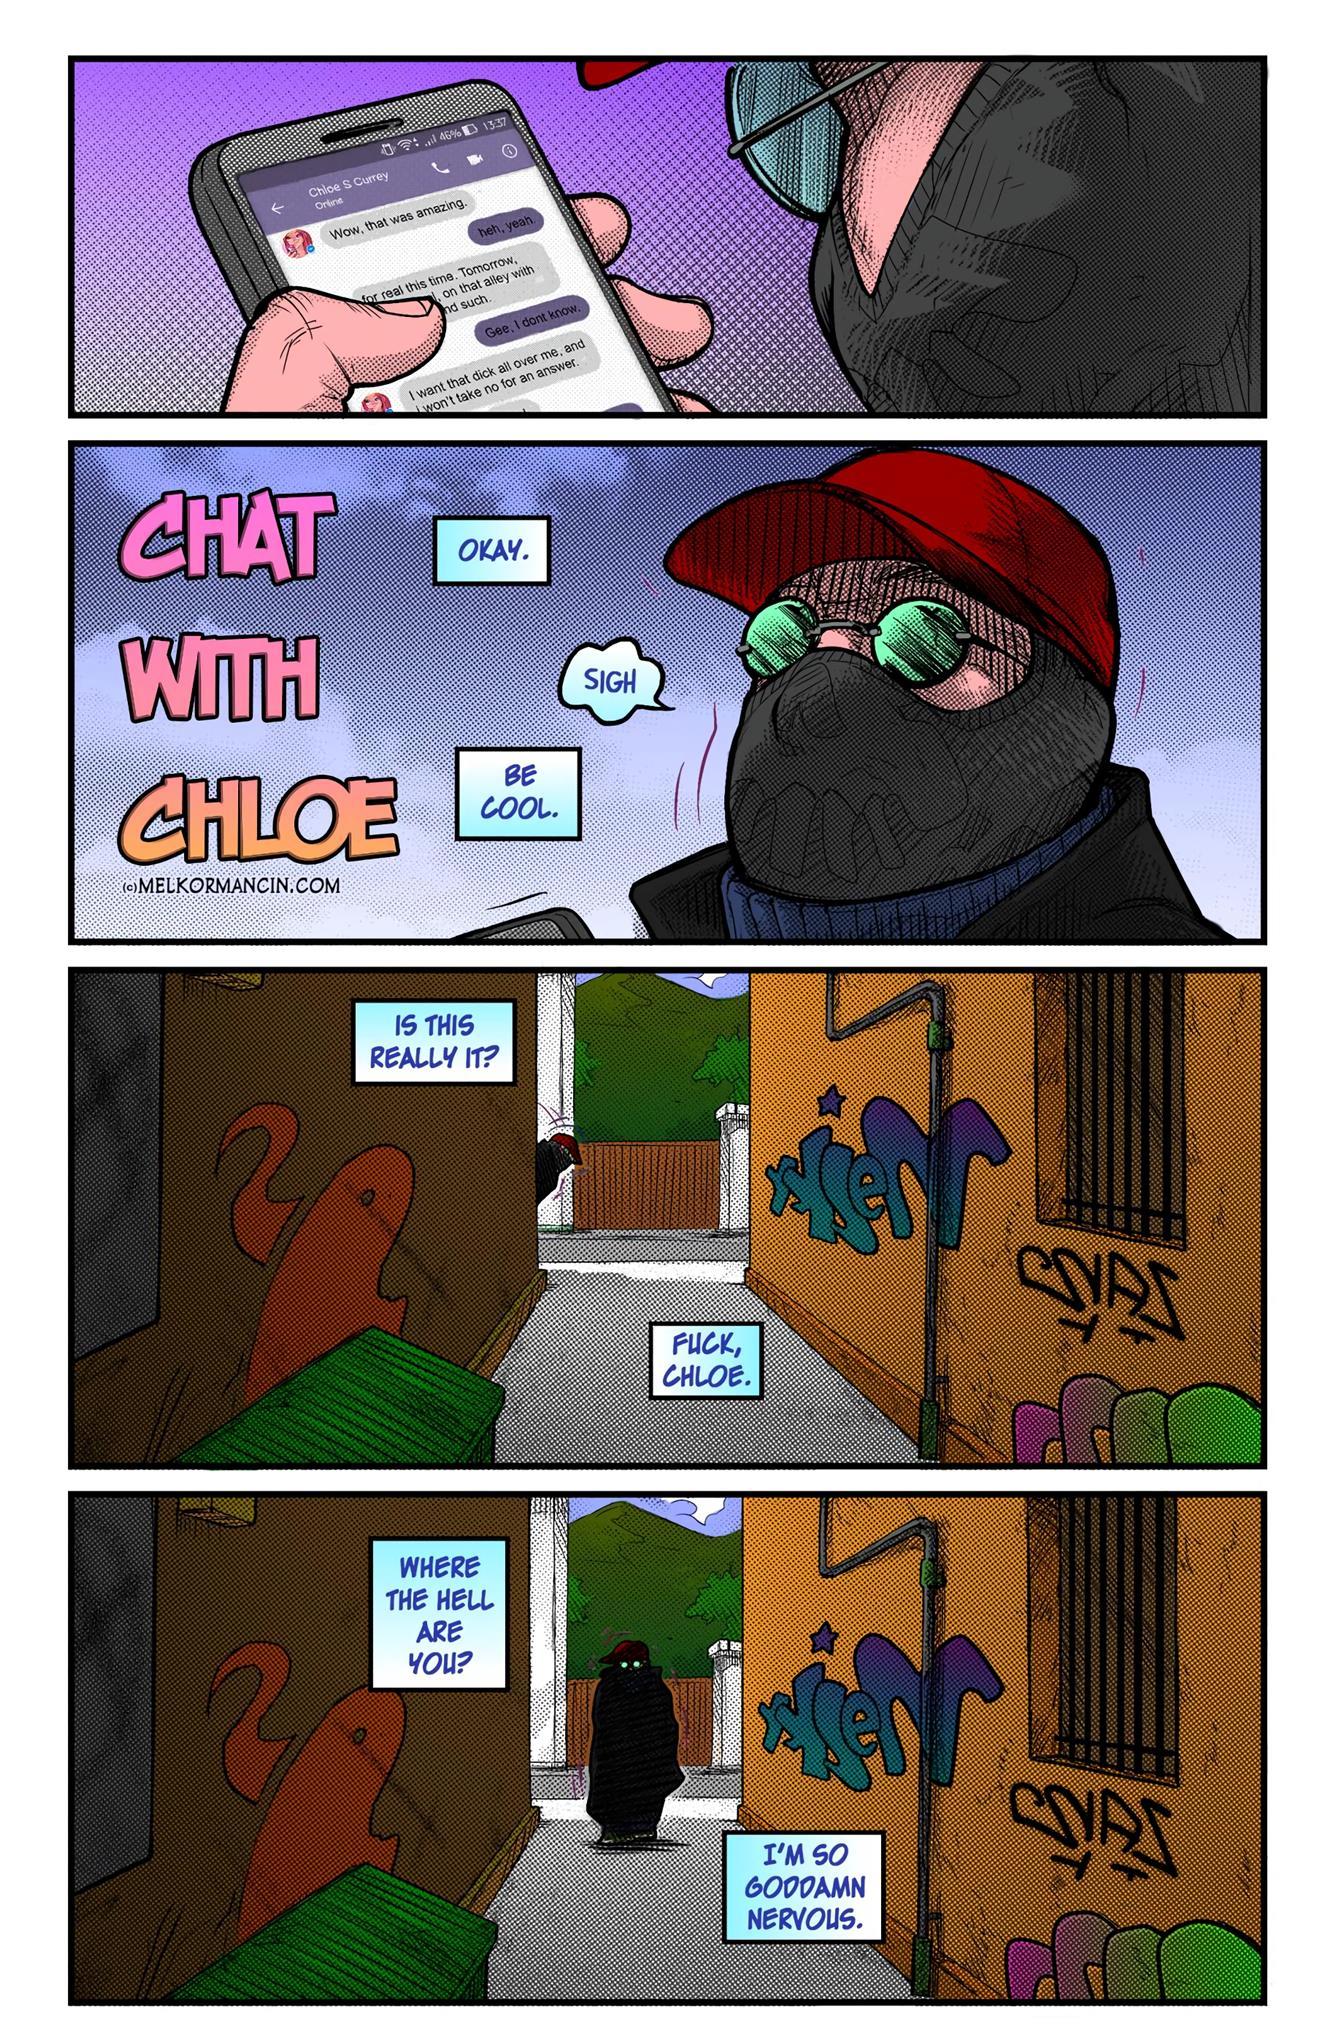 Chat with Chloe [Melkor Mancin] - Foto 27